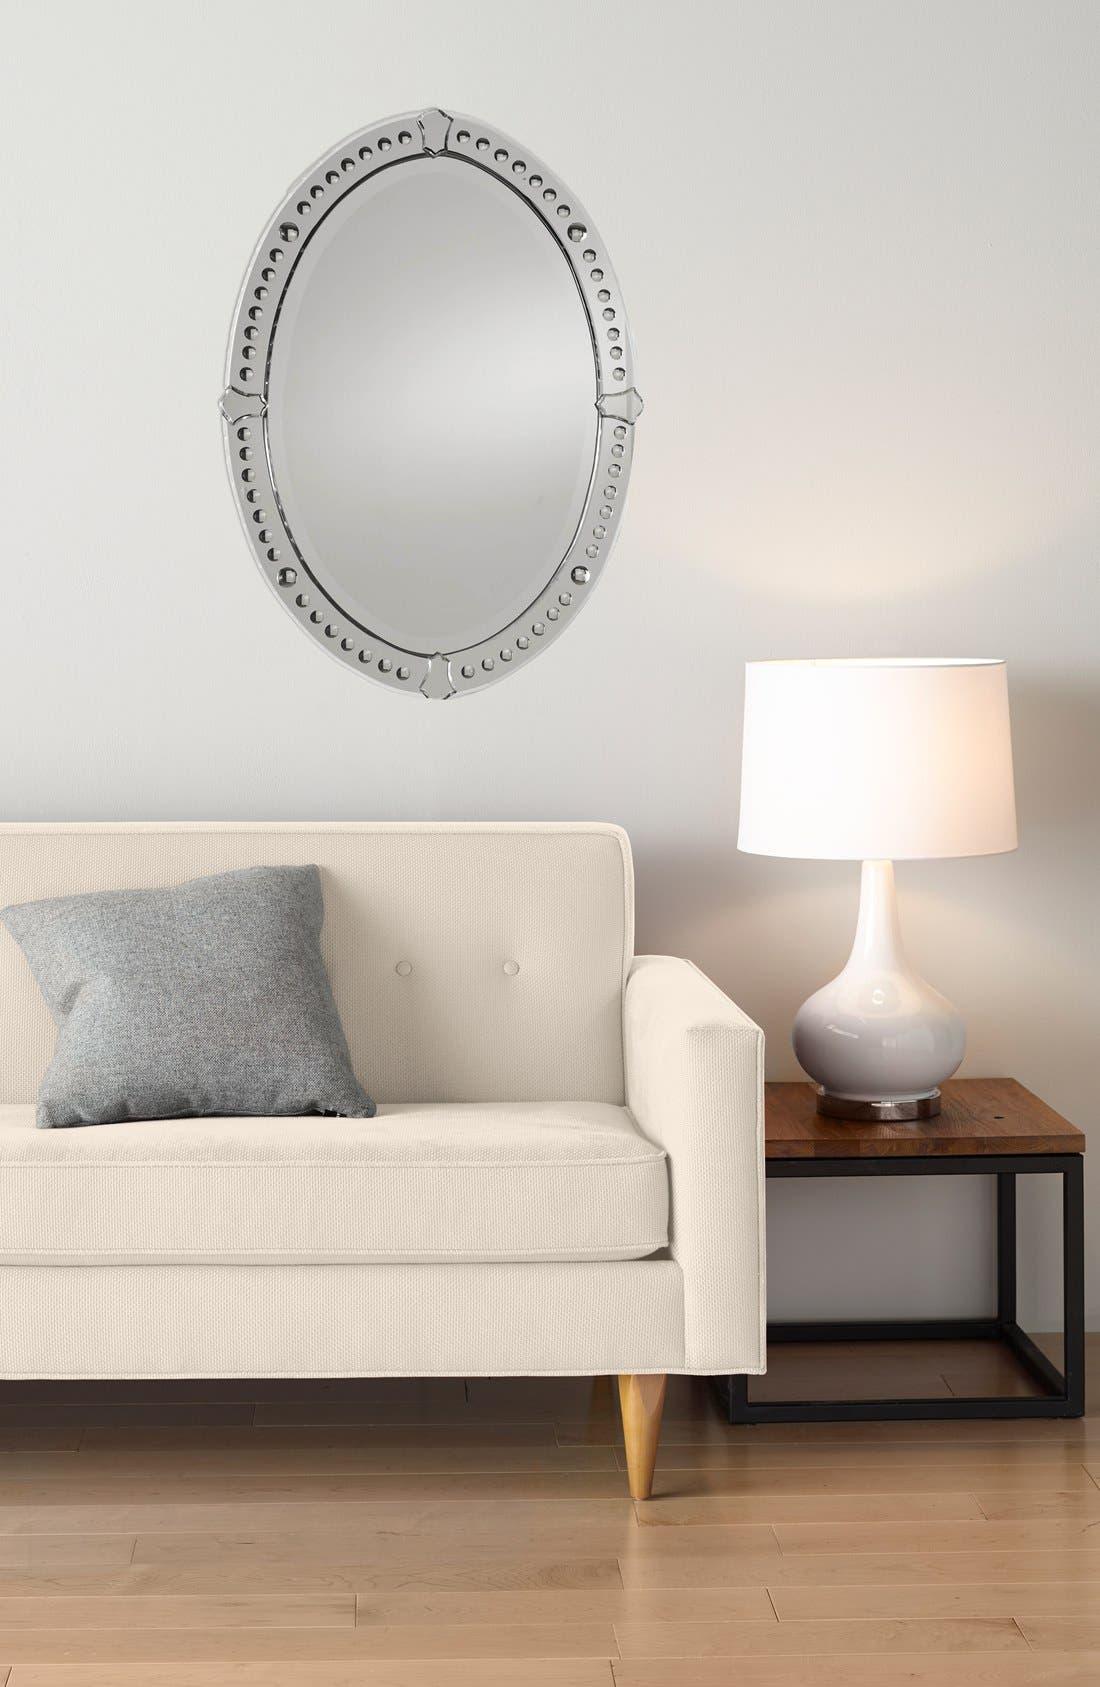 'Graziano' Frameless Oval Mirror,                             Alternate thumbnail 4, color,                             200